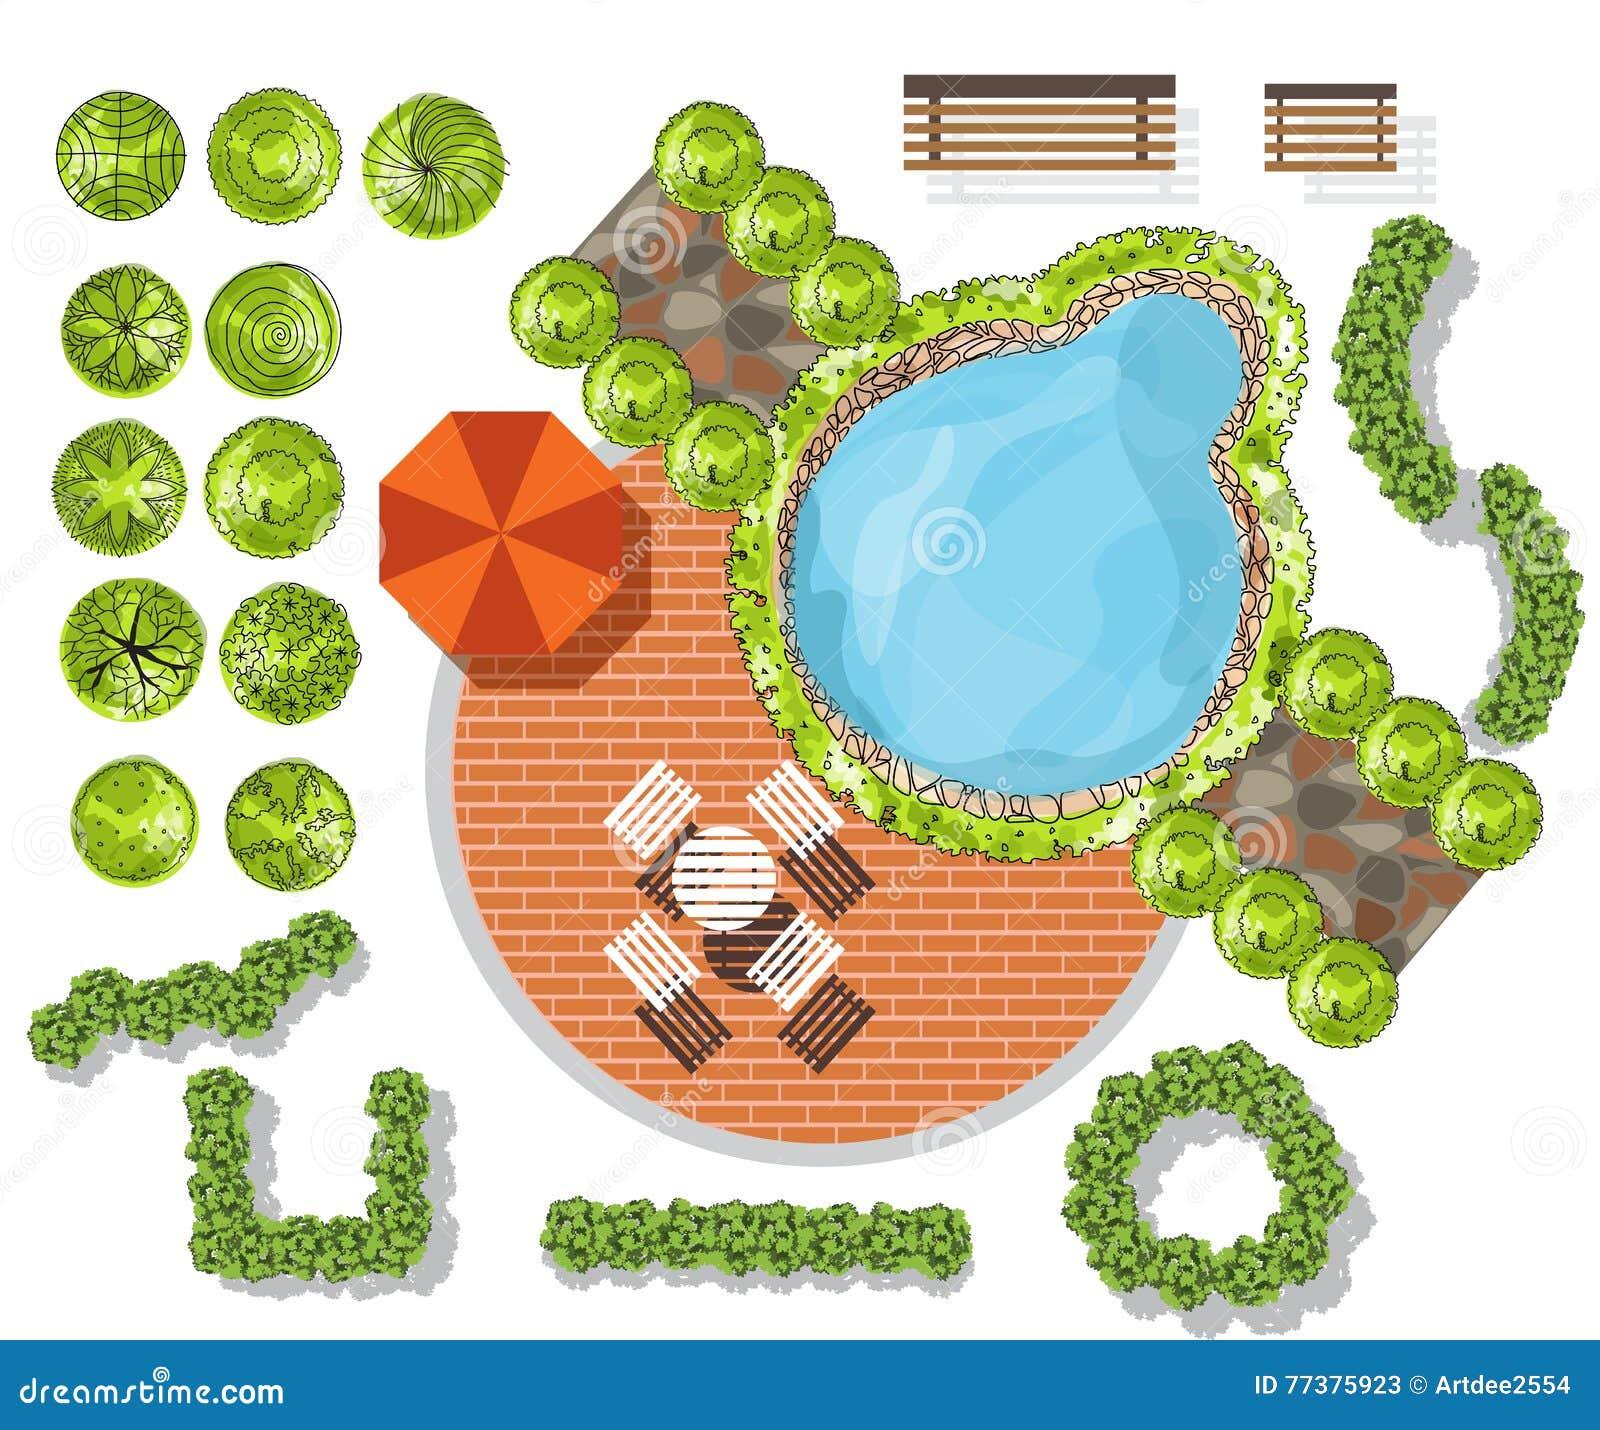 Set Of Treetop Symbols For Architectural Or Landscape Design Stock